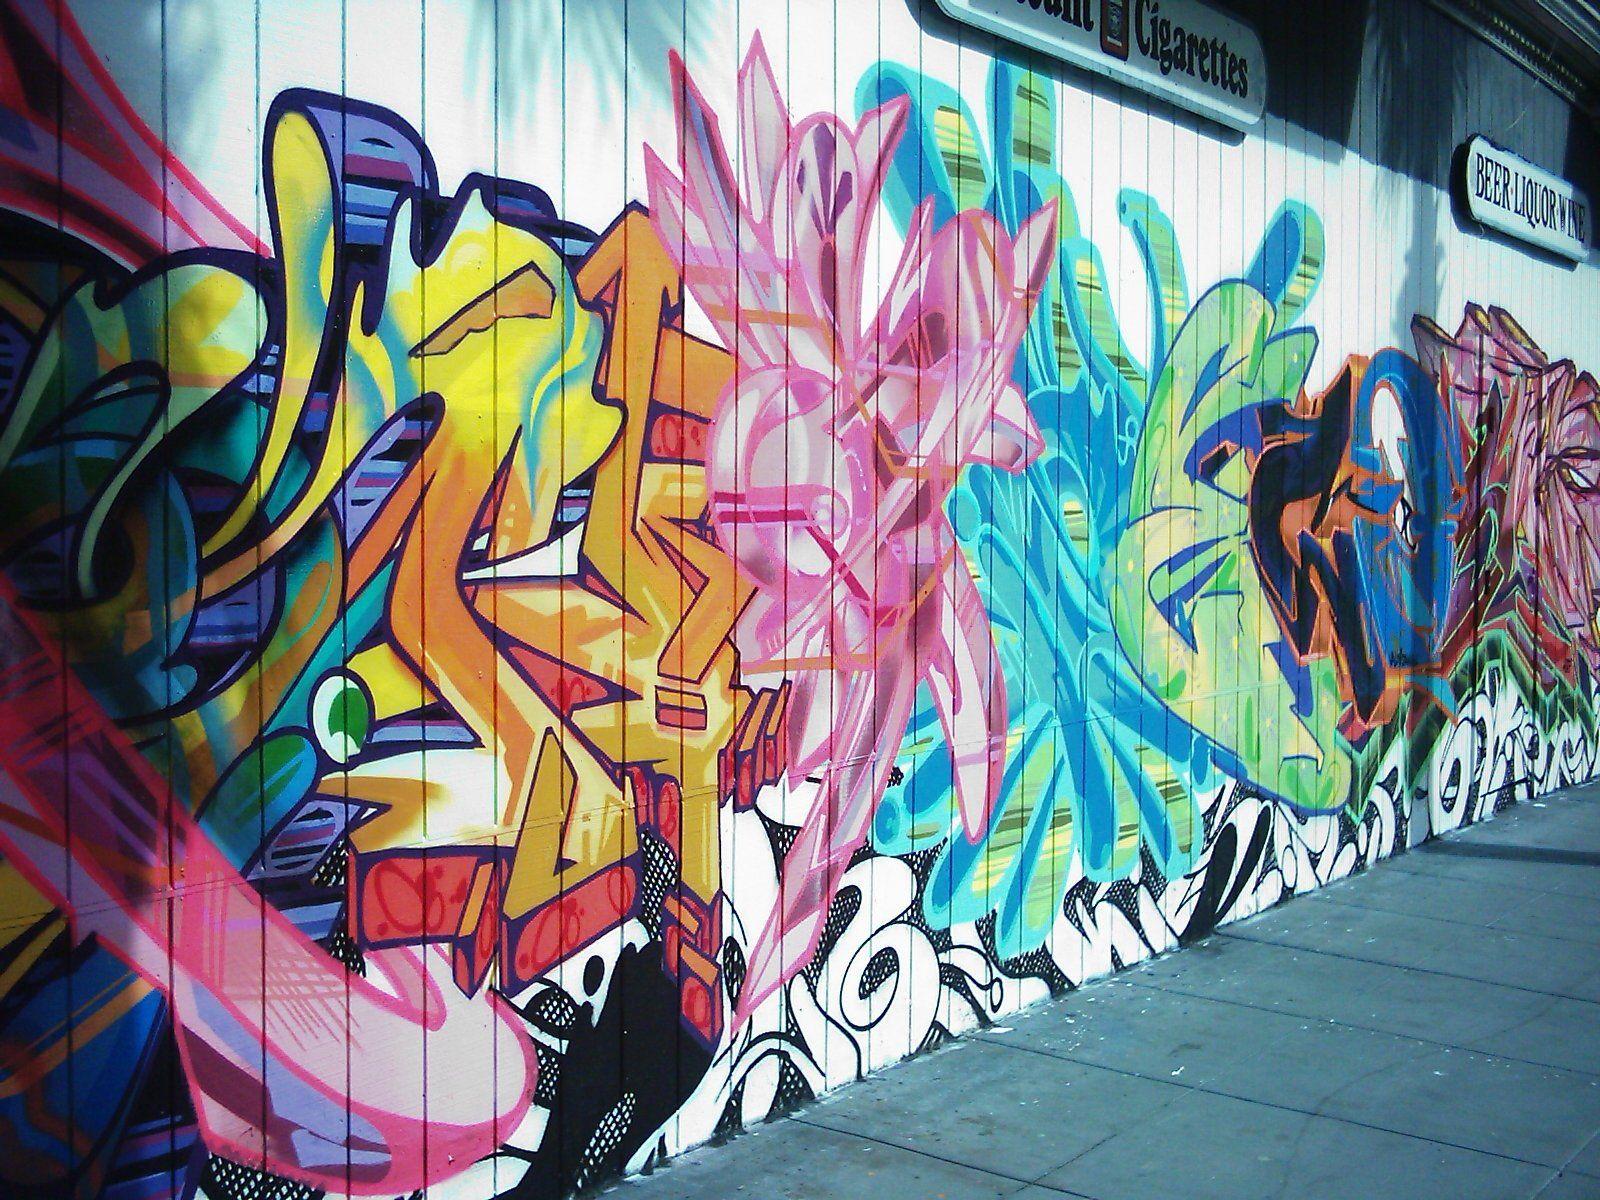 Graffiti Wallpaper X Graffiti Px Free Download Hd Hd Wallpapers  ~ Papel De Parede Grafite Para Quarto